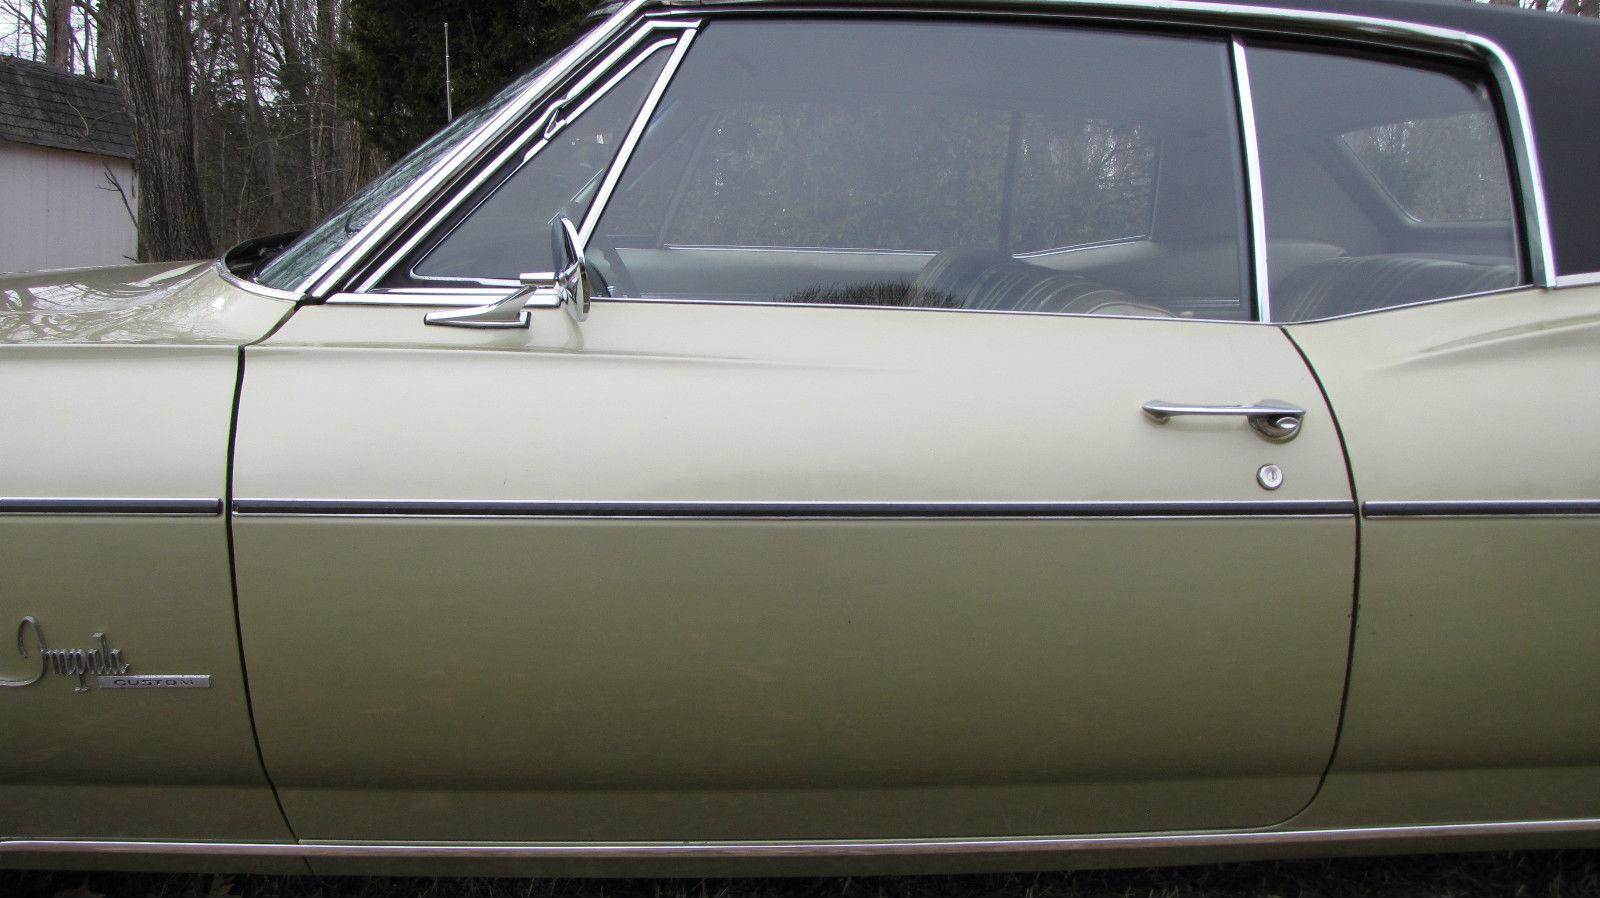 1968 Chevrolet Impala Unmolested Original Low Miles 2 Door Coupe Prevnext